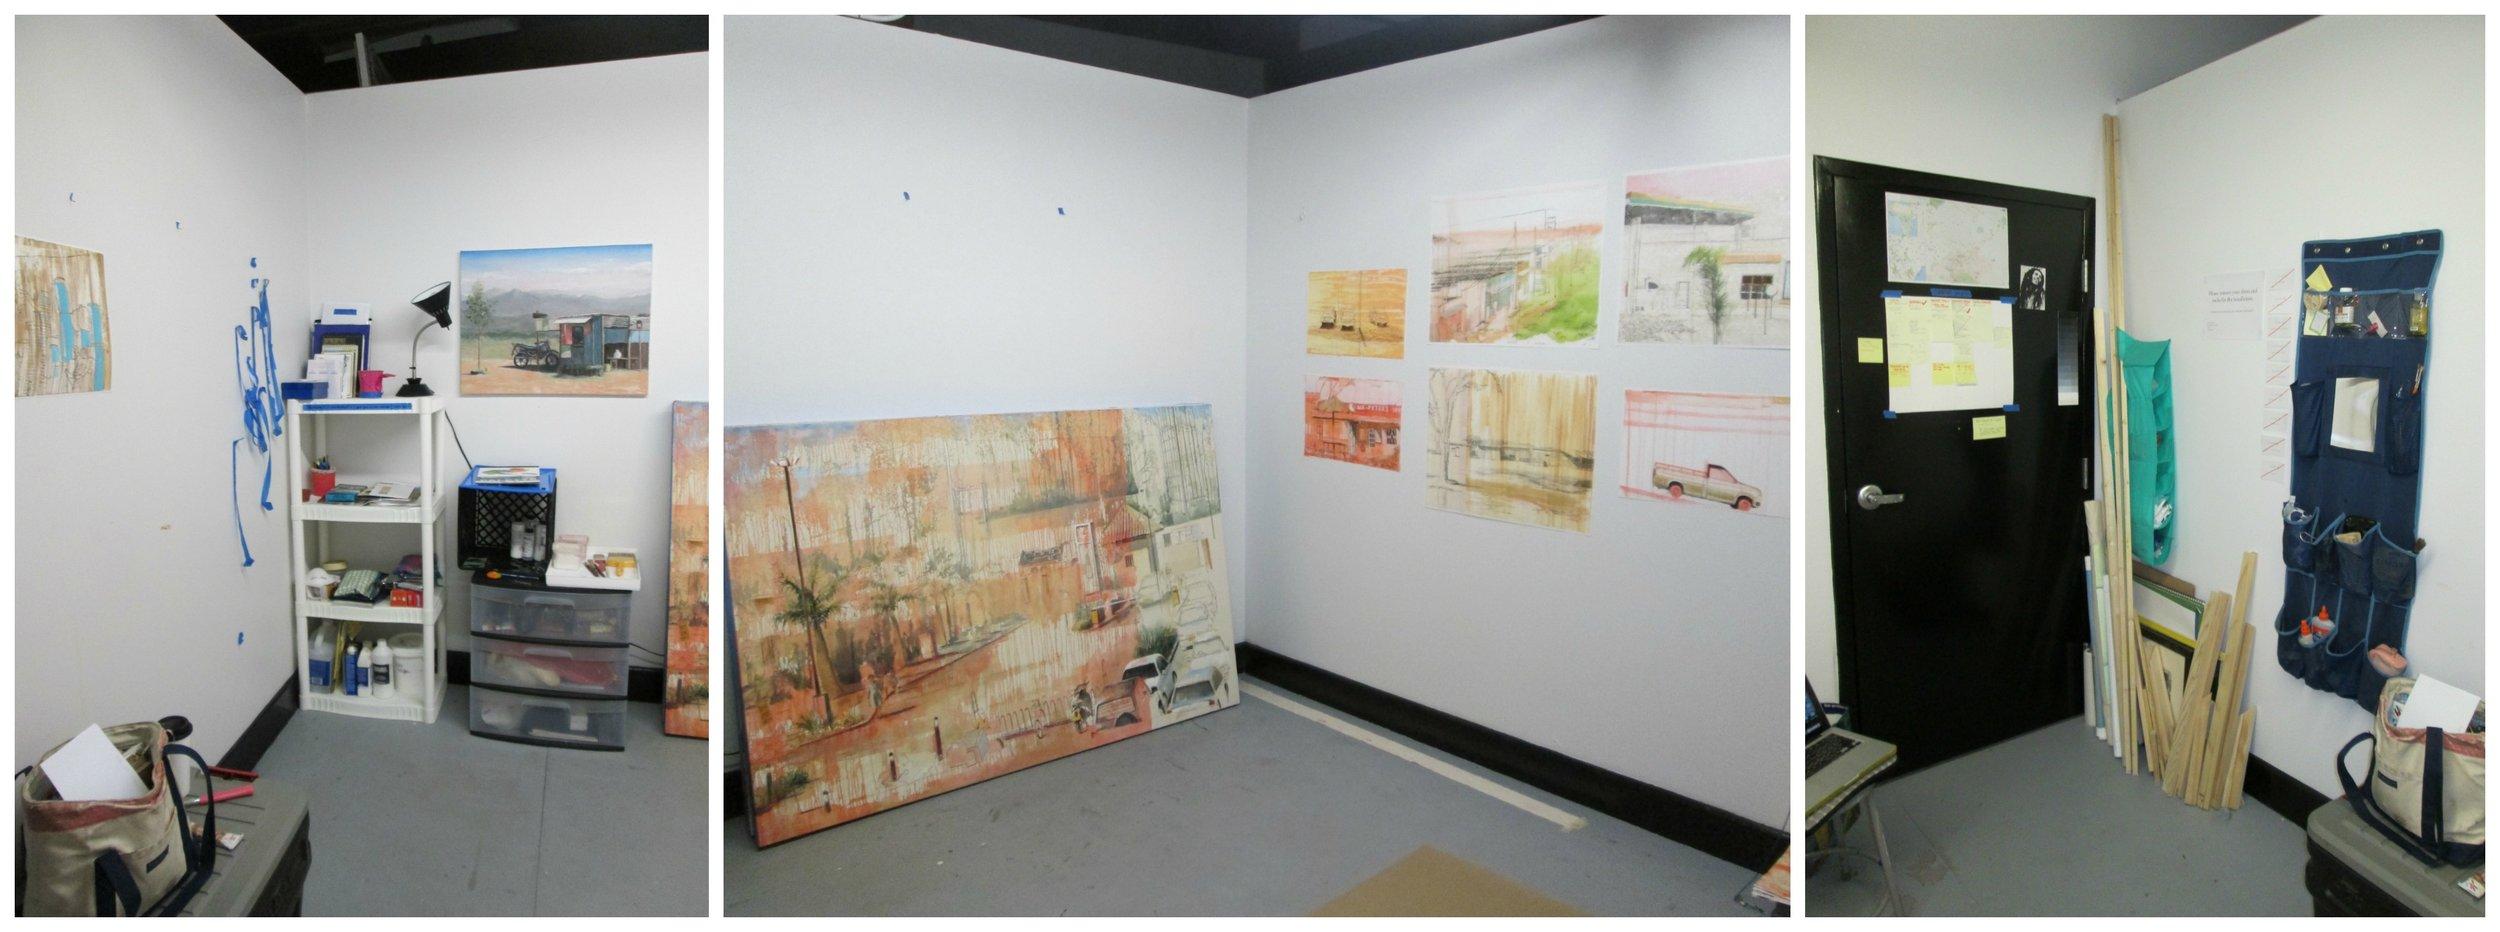 Kira Milligan's Studio